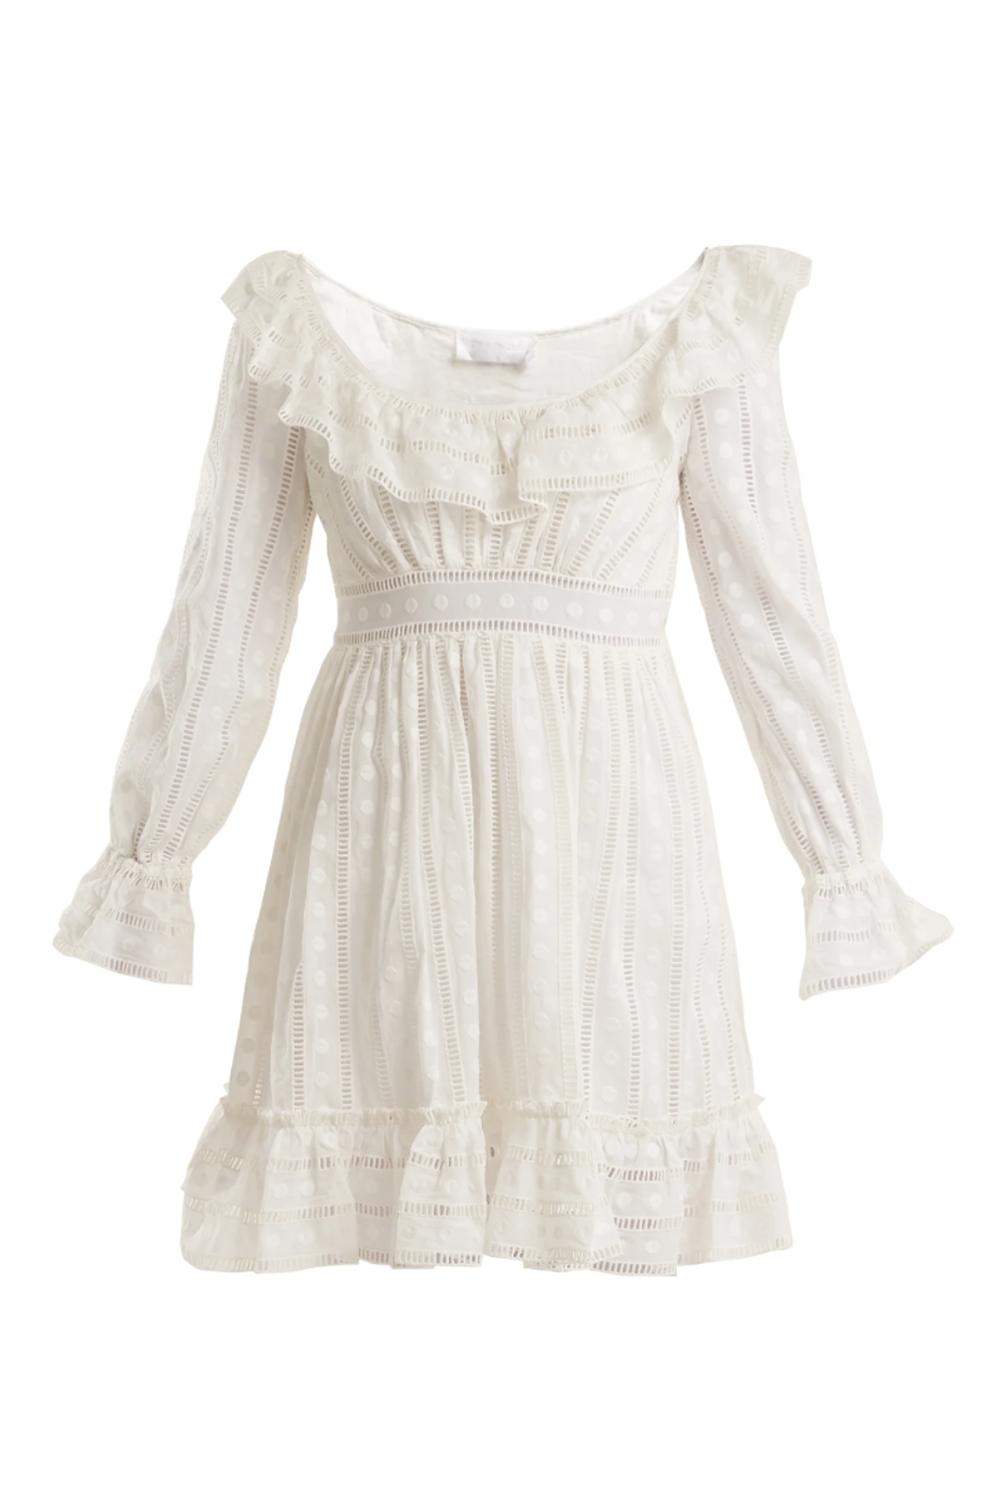 Melody Ladder-Lace Dress Zimmermann matchesfashion.com $397.00 SHOP IT